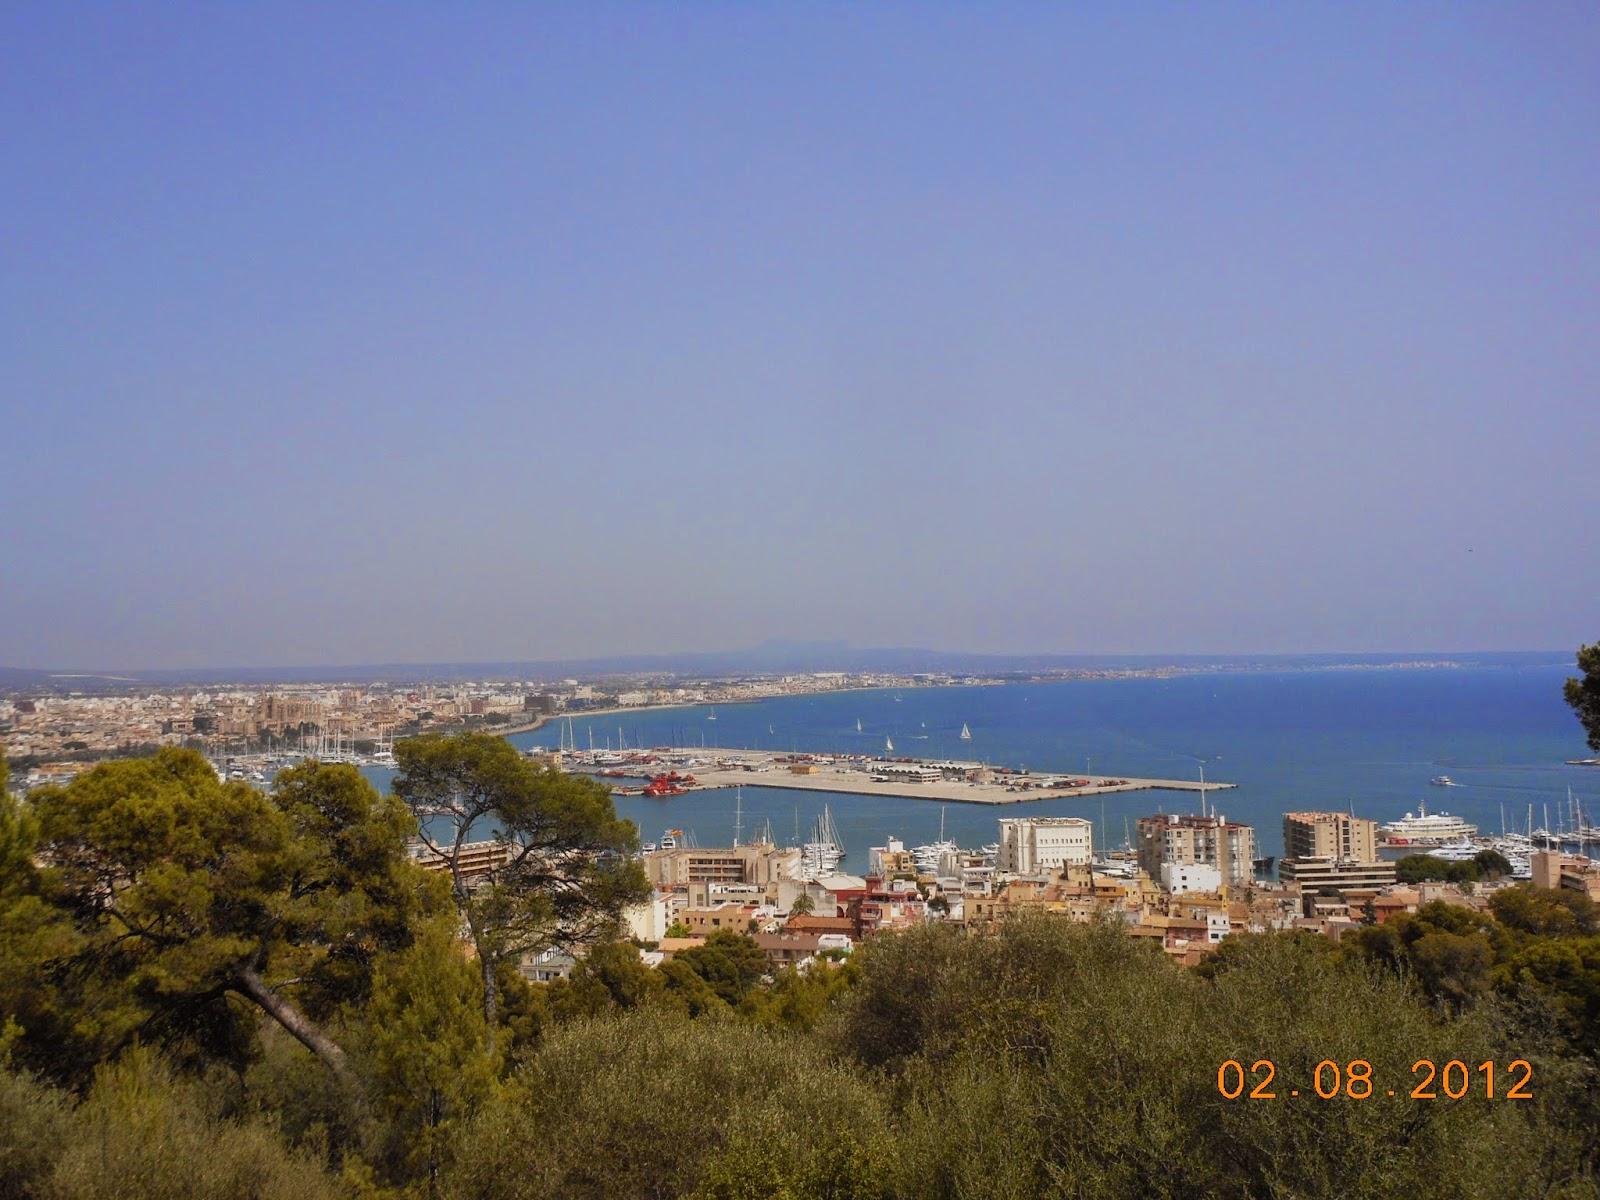 Vista do Castelo Bellver para a cidade de Palma de Maiorca - Espanha